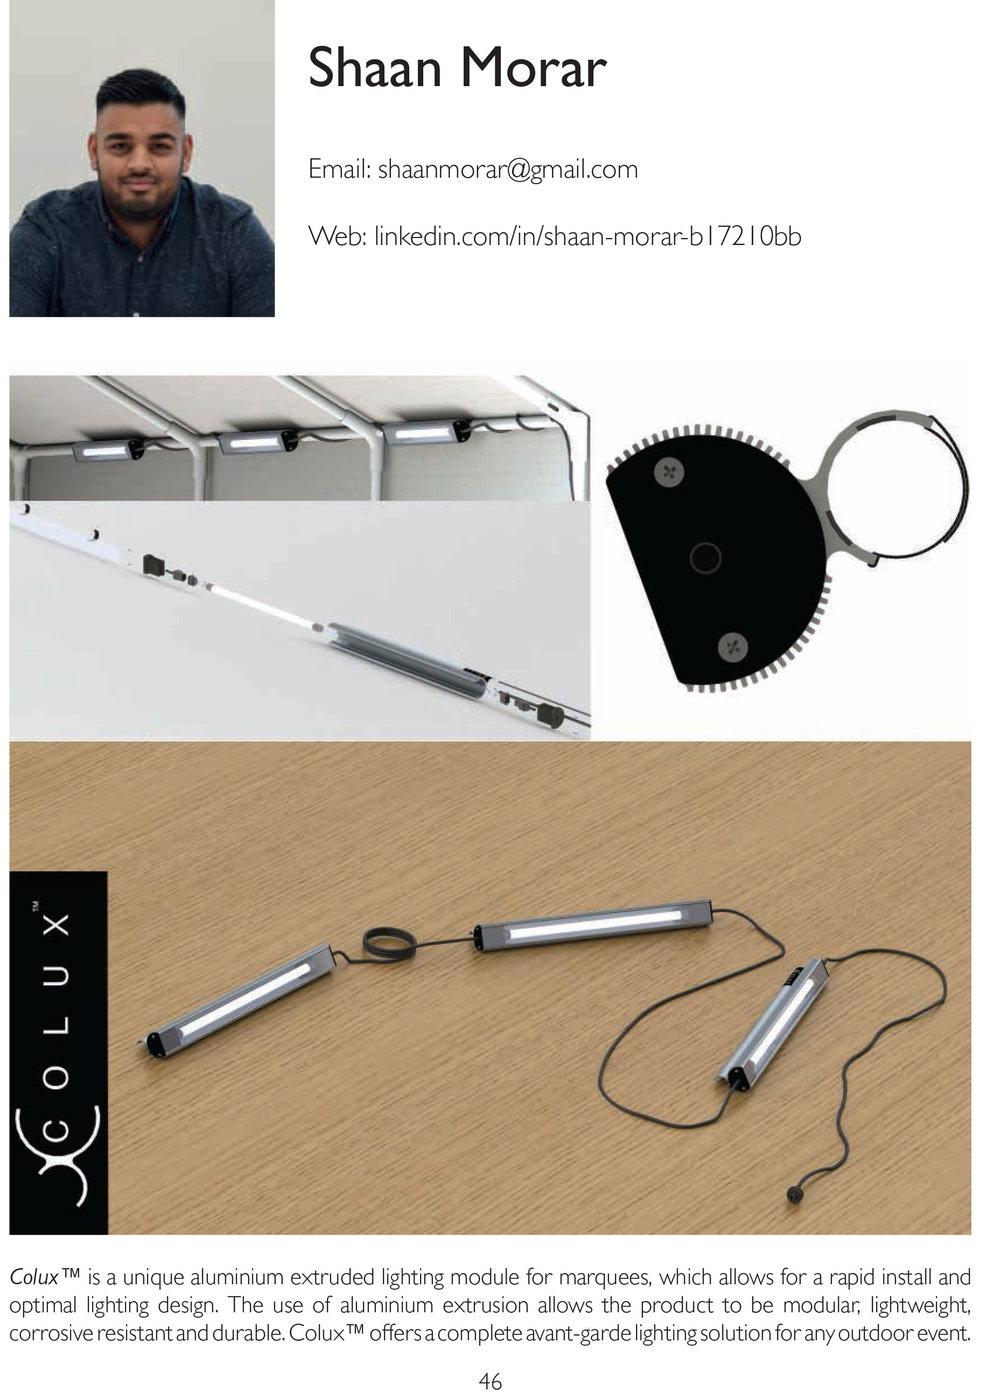 BSc Product Design - Brochure - NTU Degree Show 2017-48.jpg